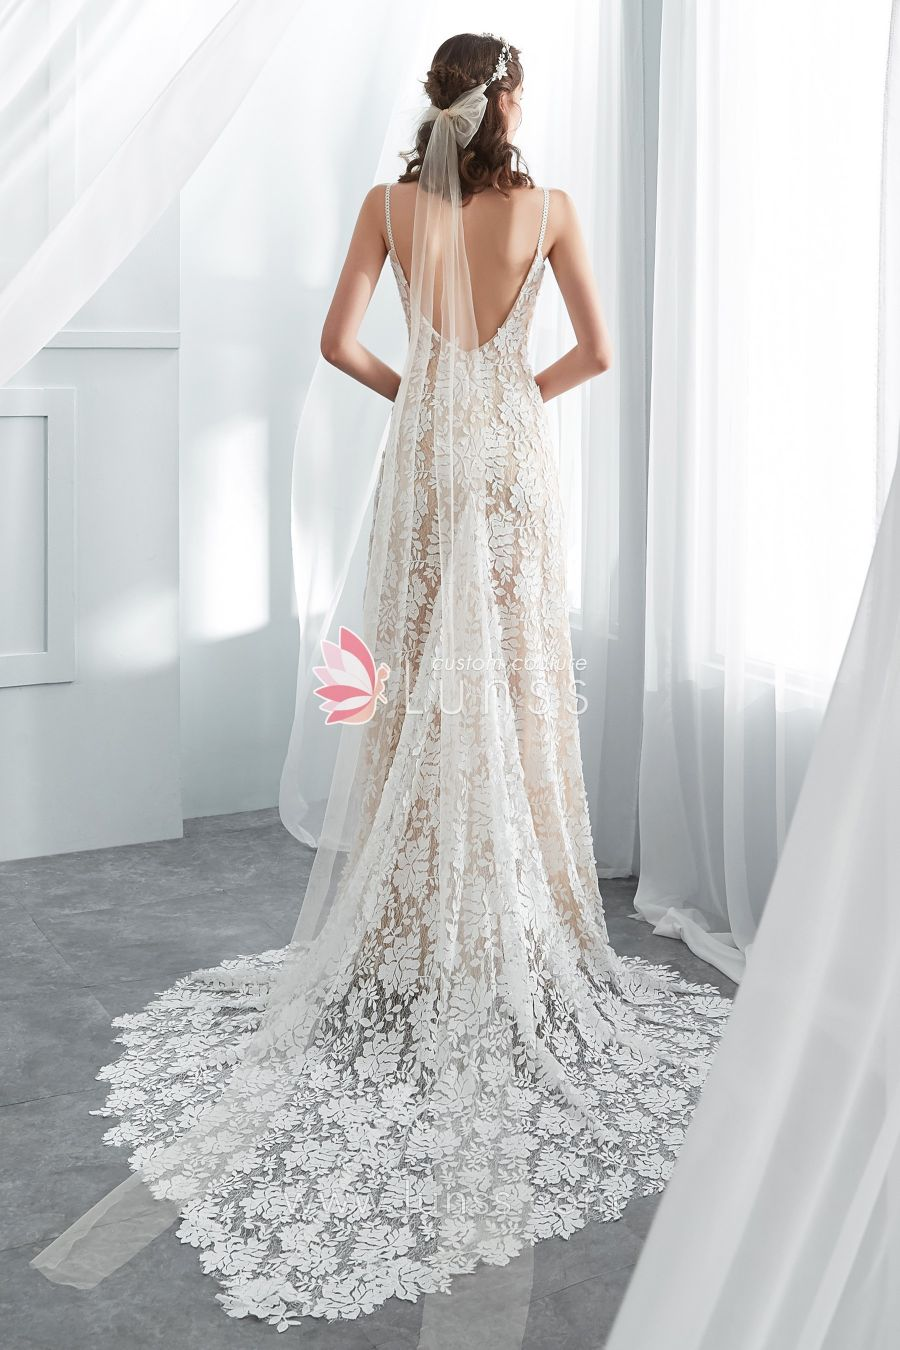 High Quality Custom Made Designer Boho Wedding Gowns Lunss